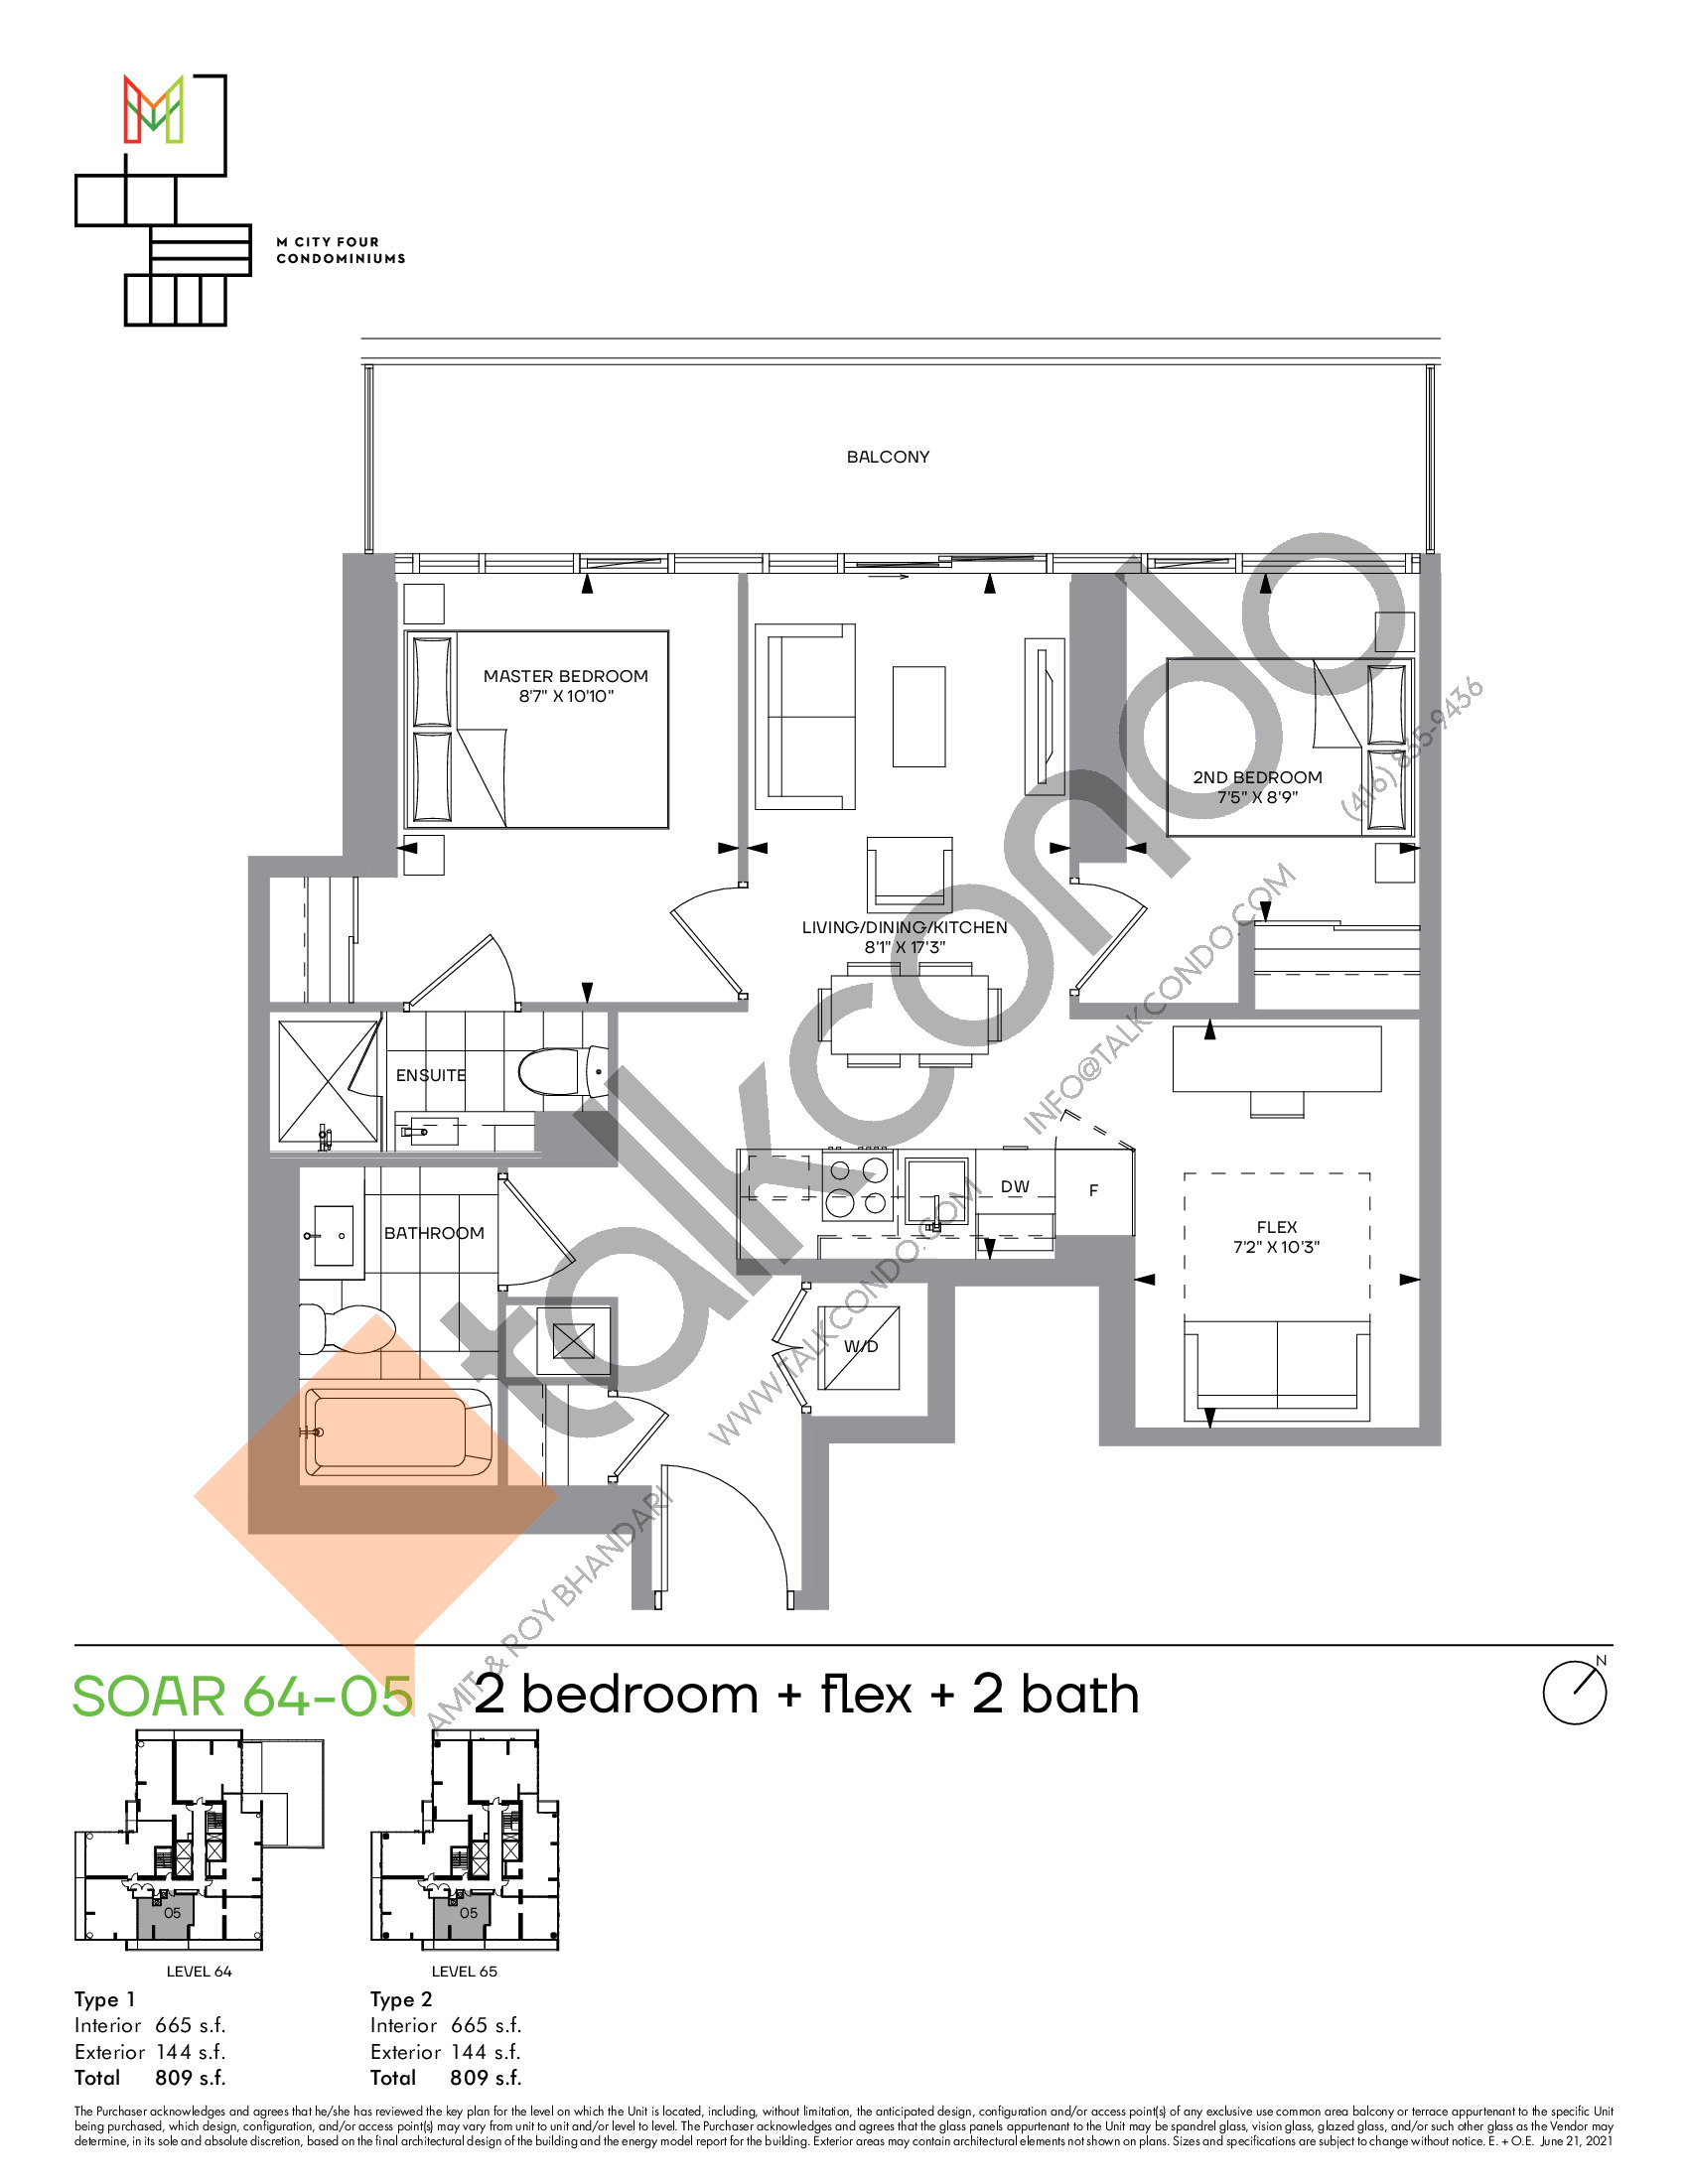 Soar 64-05 Floor Plan at M4 Condos - 665 sq.ft